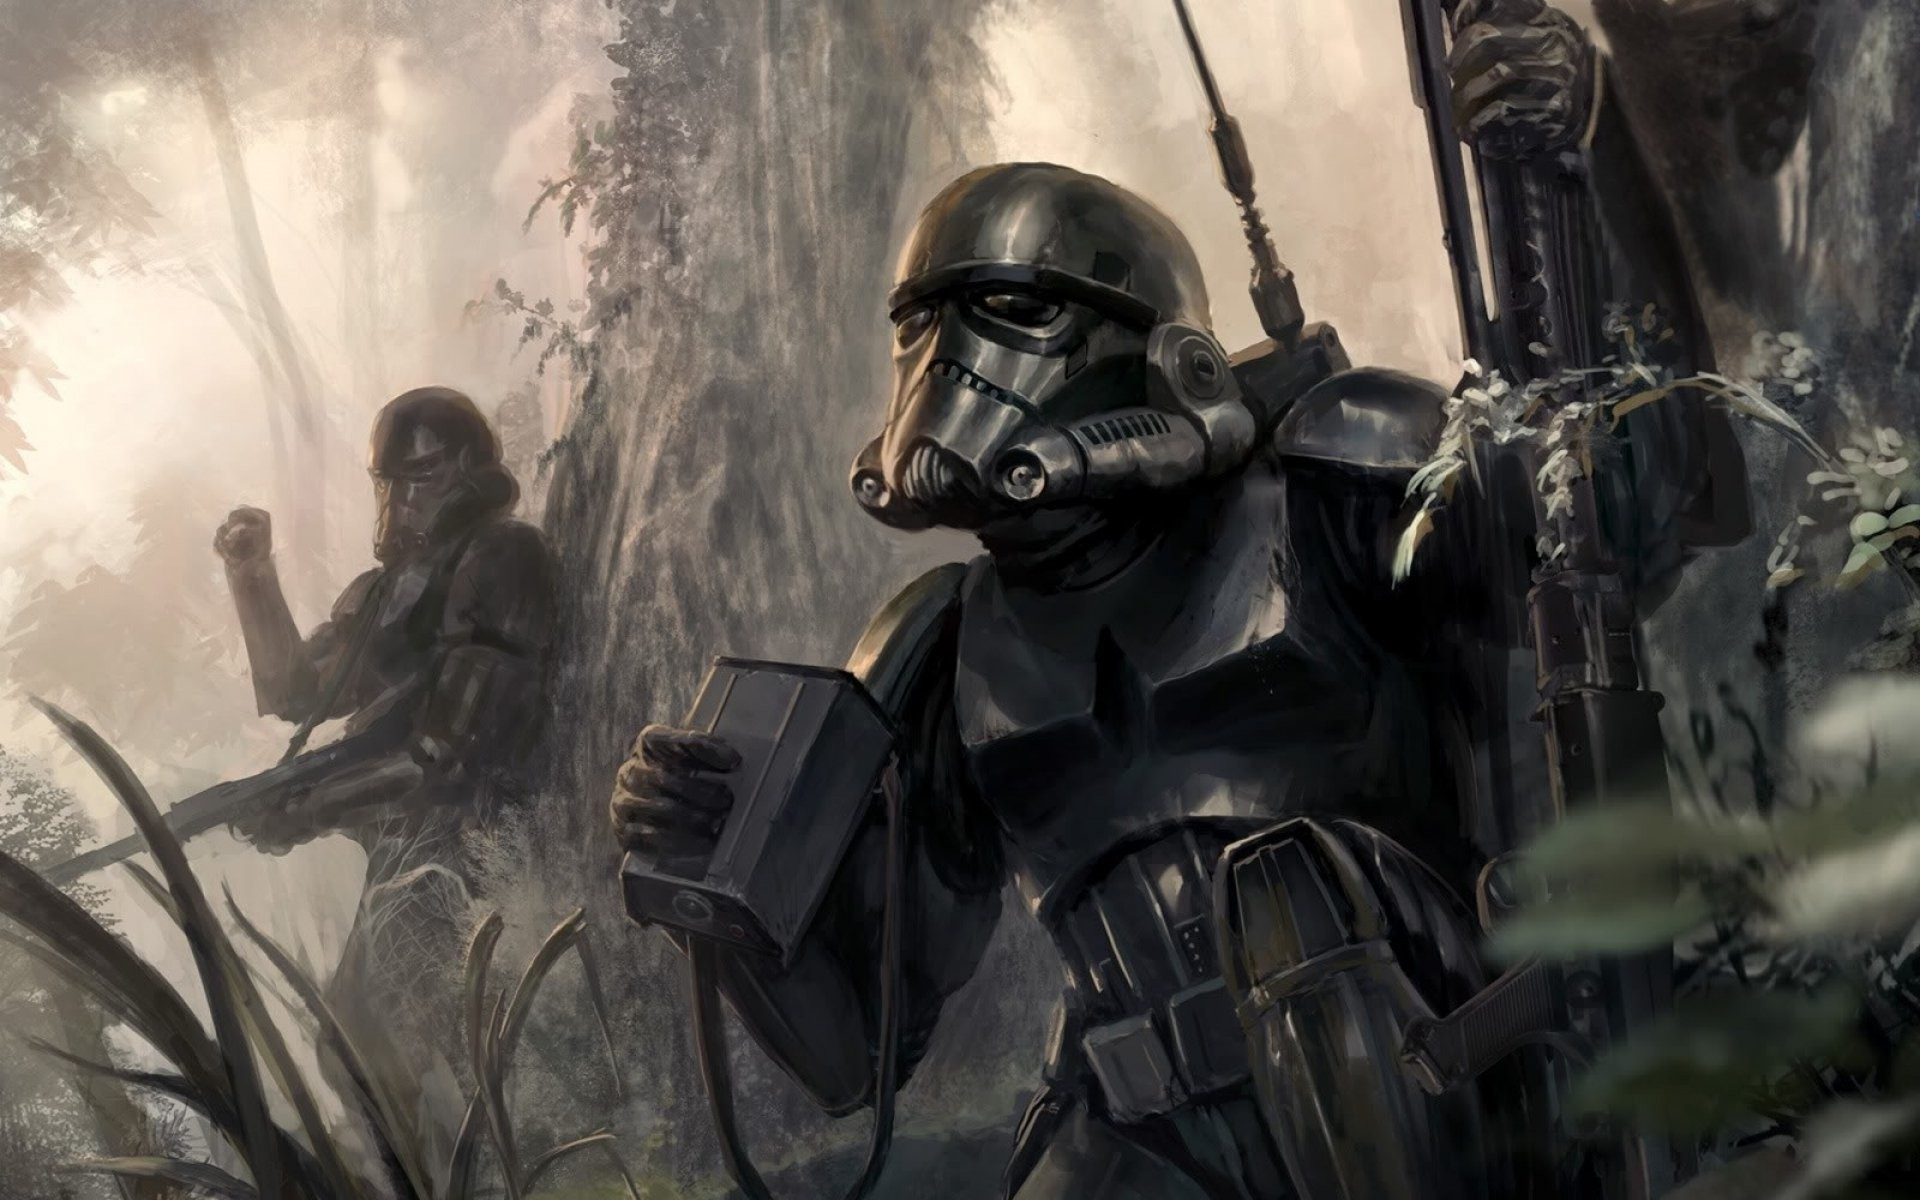 Star Wars Art 798247 …